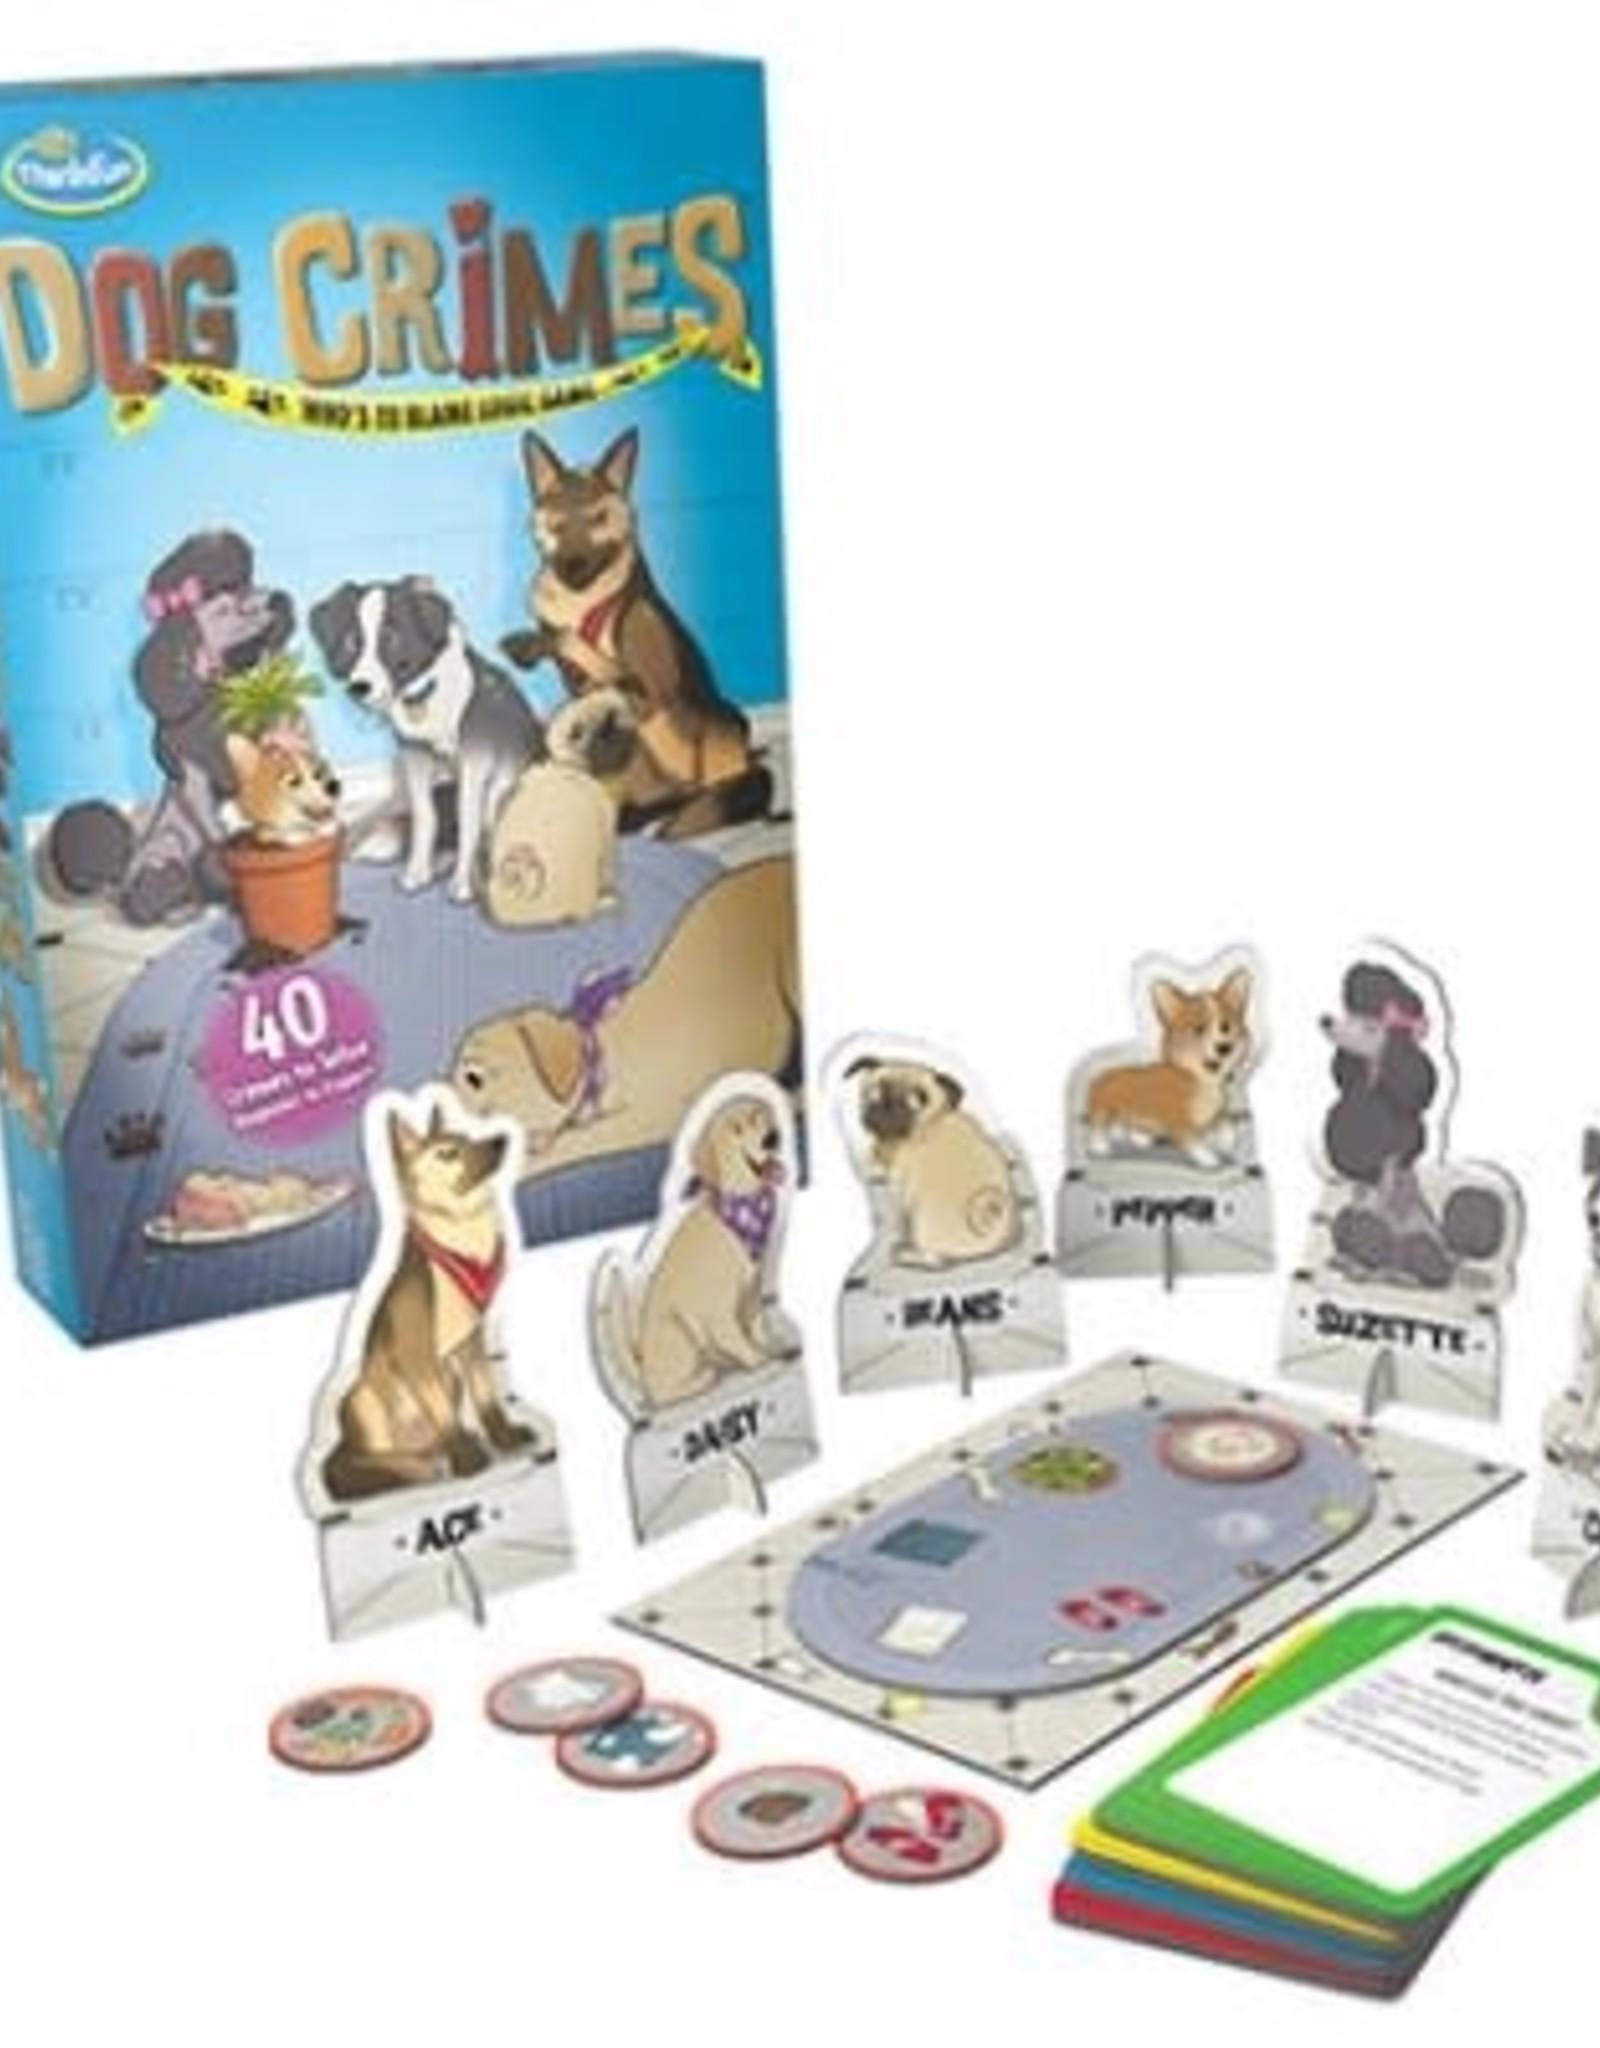 ThinkFun Dog Crimes Game